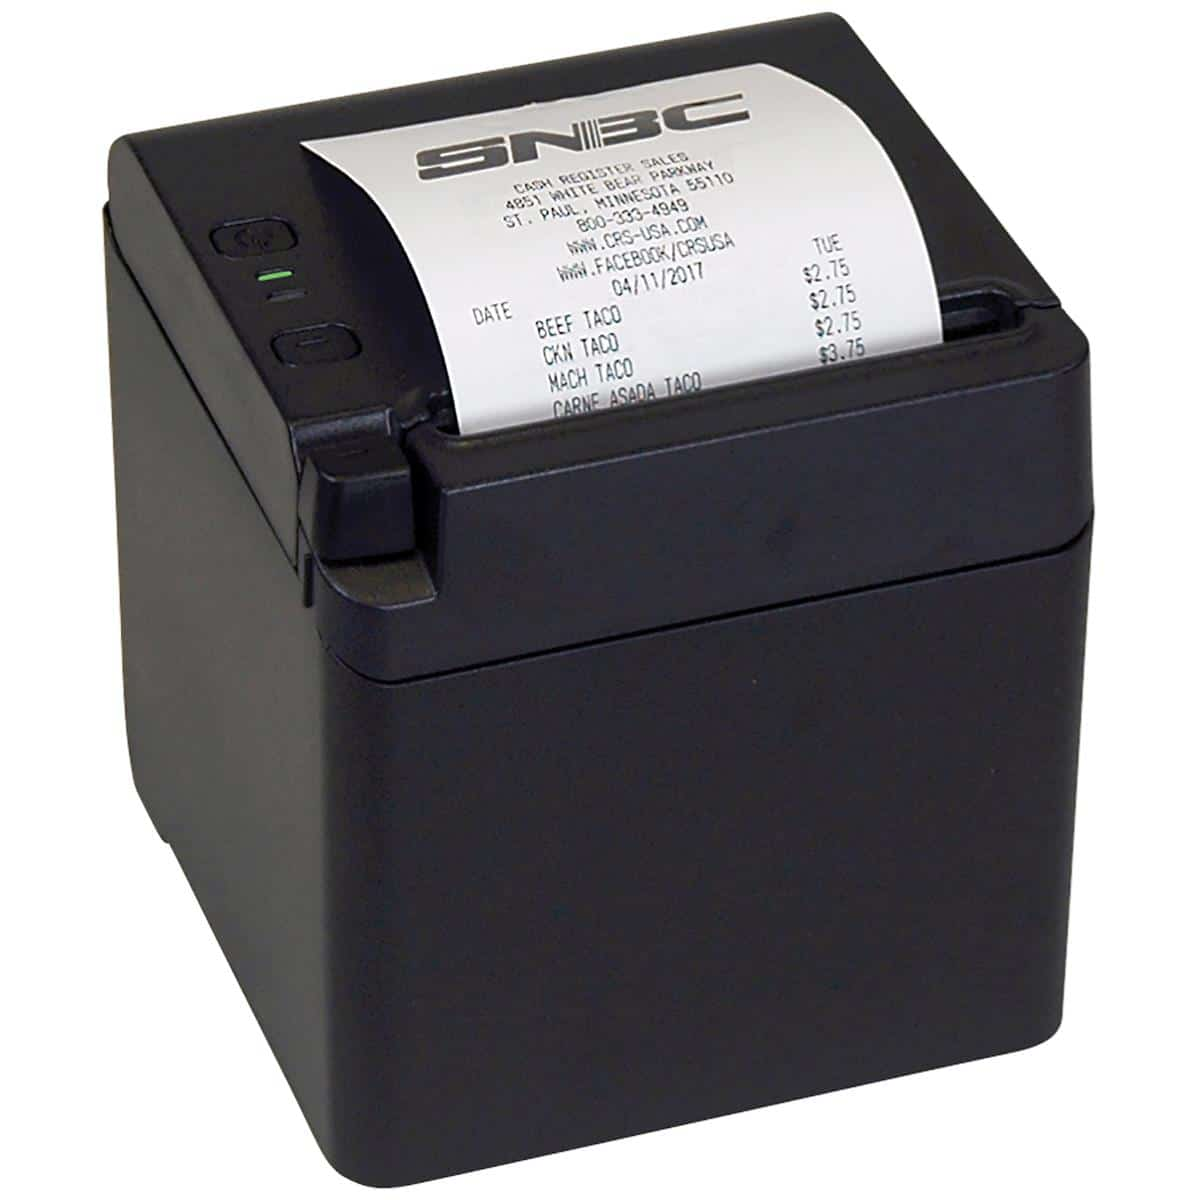 SNBC BTP-S80 Thermal Printer - (USB/Serial/Ethernet)| JaimePOS A Leading POS & Merchant Services Provider